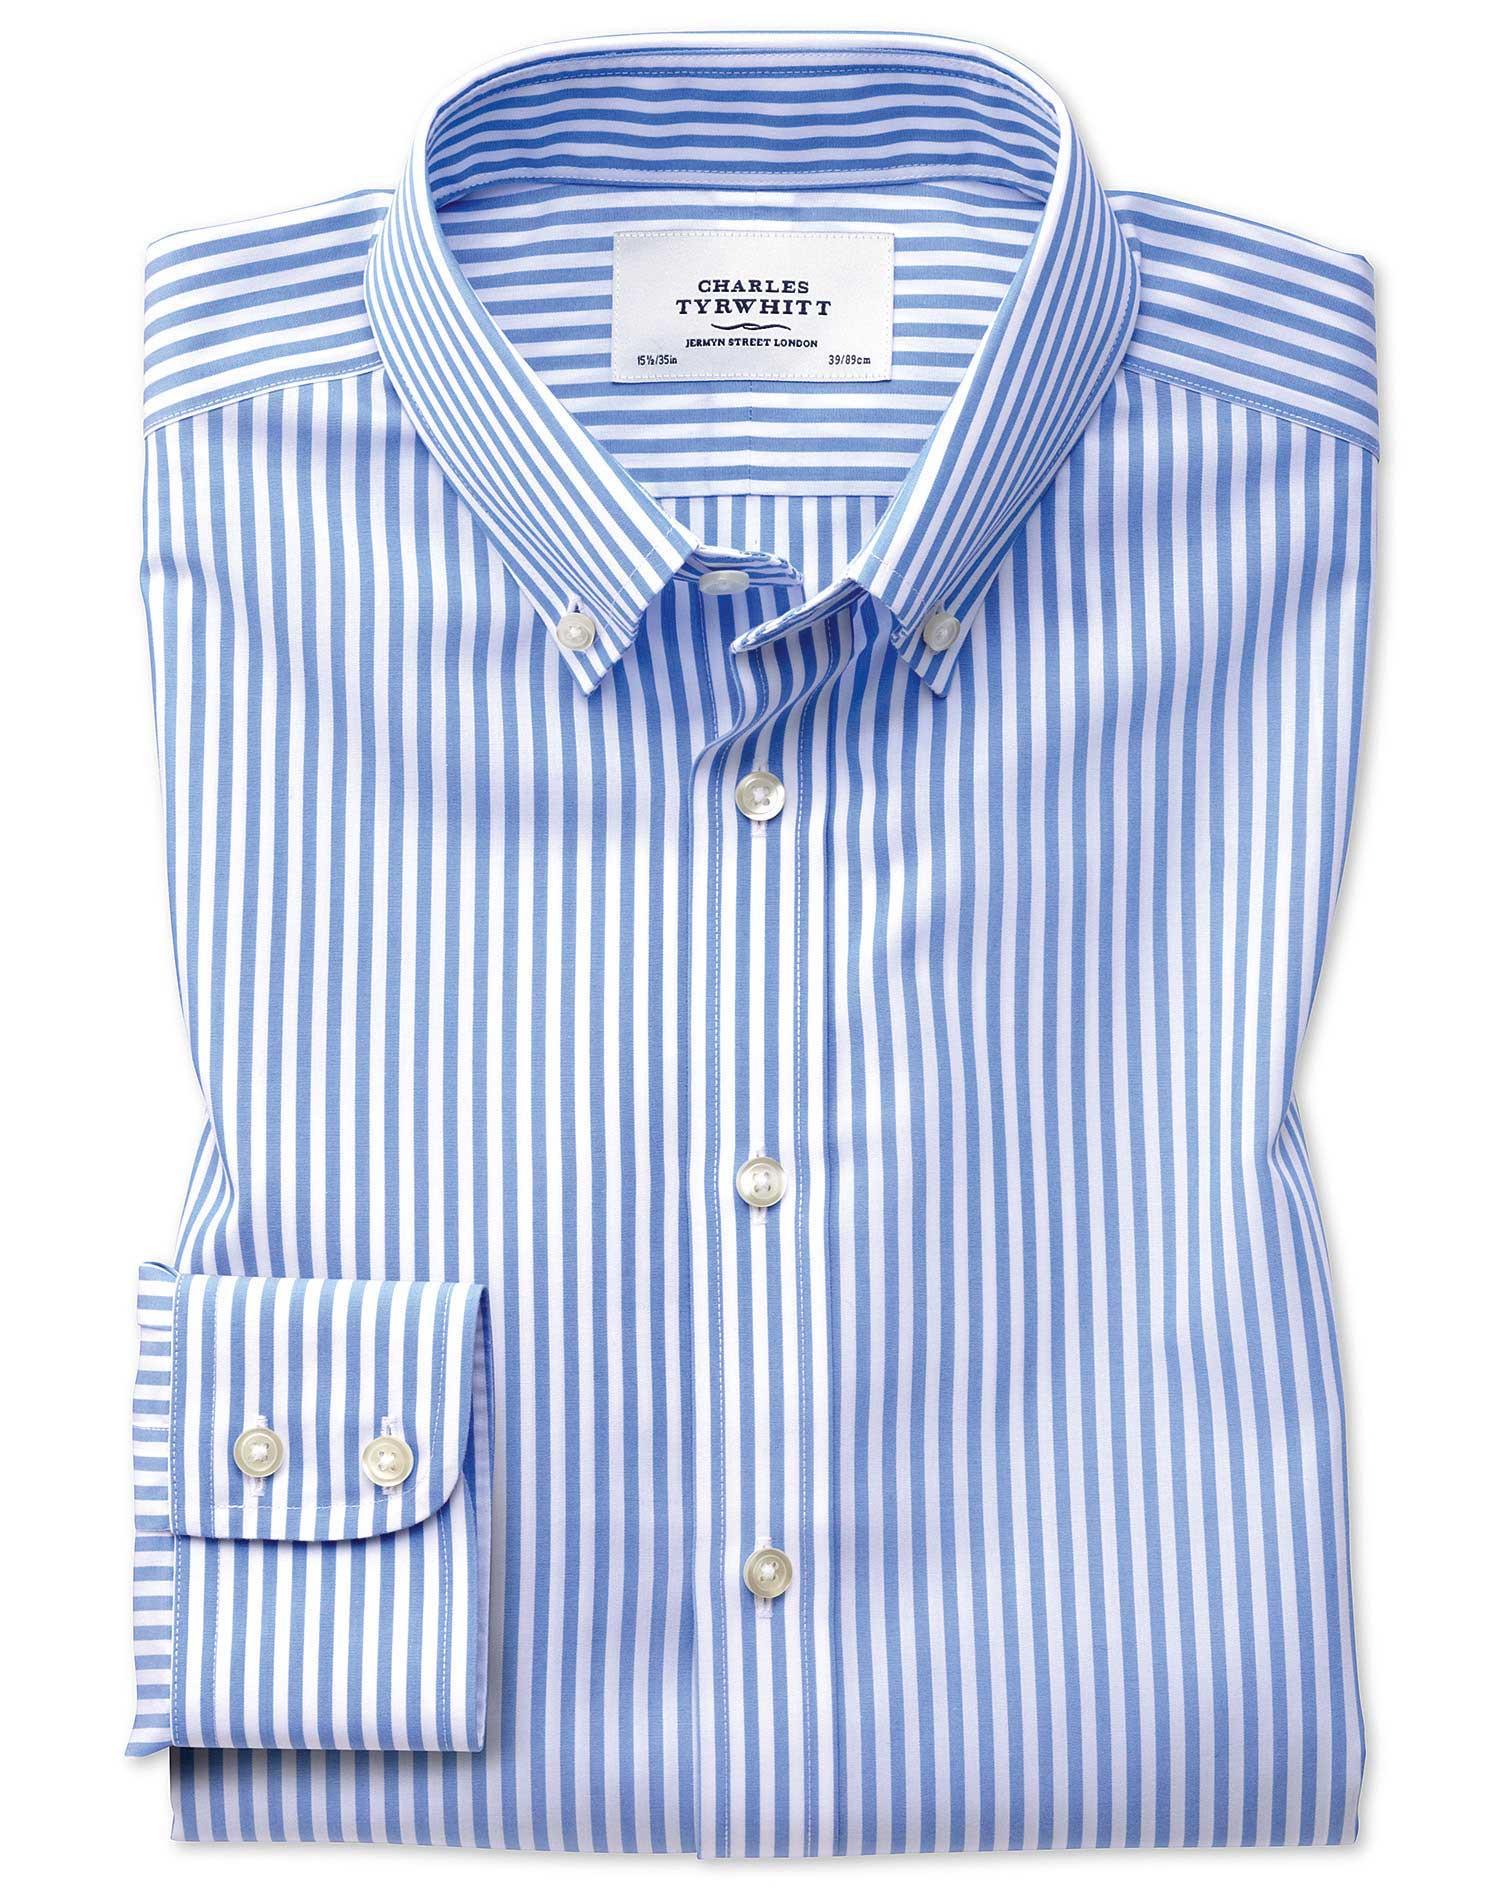 Extra Slim Fit Button-Down Non-Iron Sky Blue Stripe Check Cotton Formal Shirt Single Cuff Size 16.5/